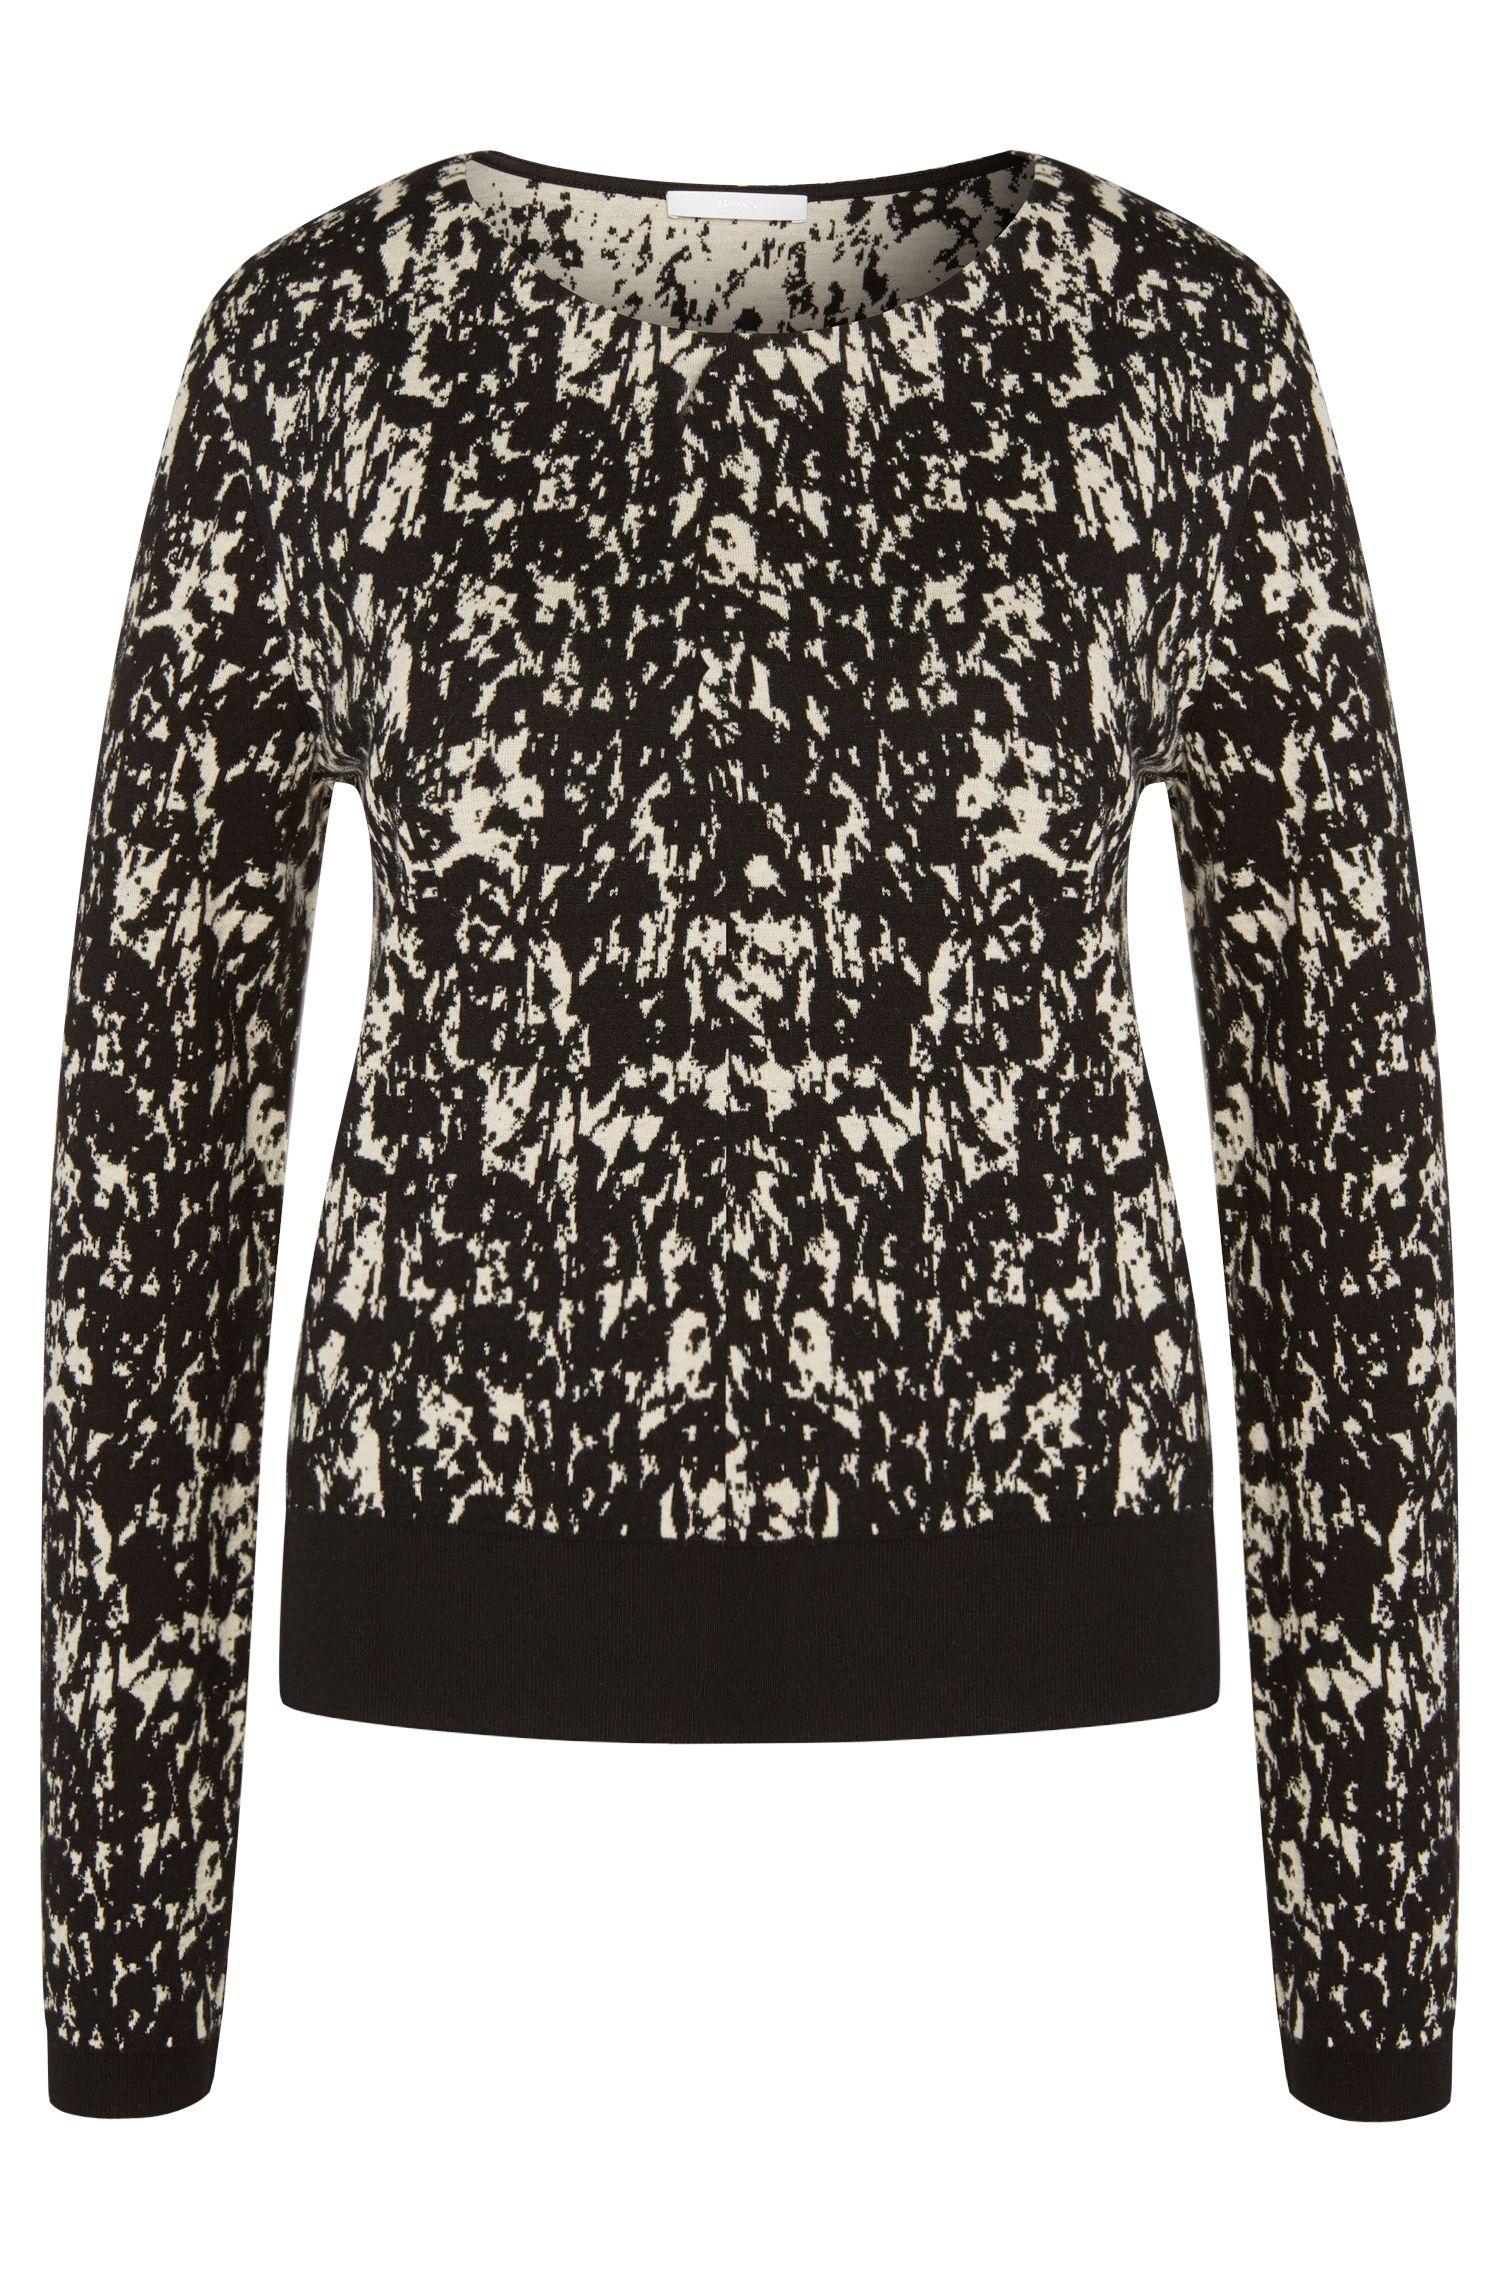 Patterned sweater in viscose blend: 'Emka'